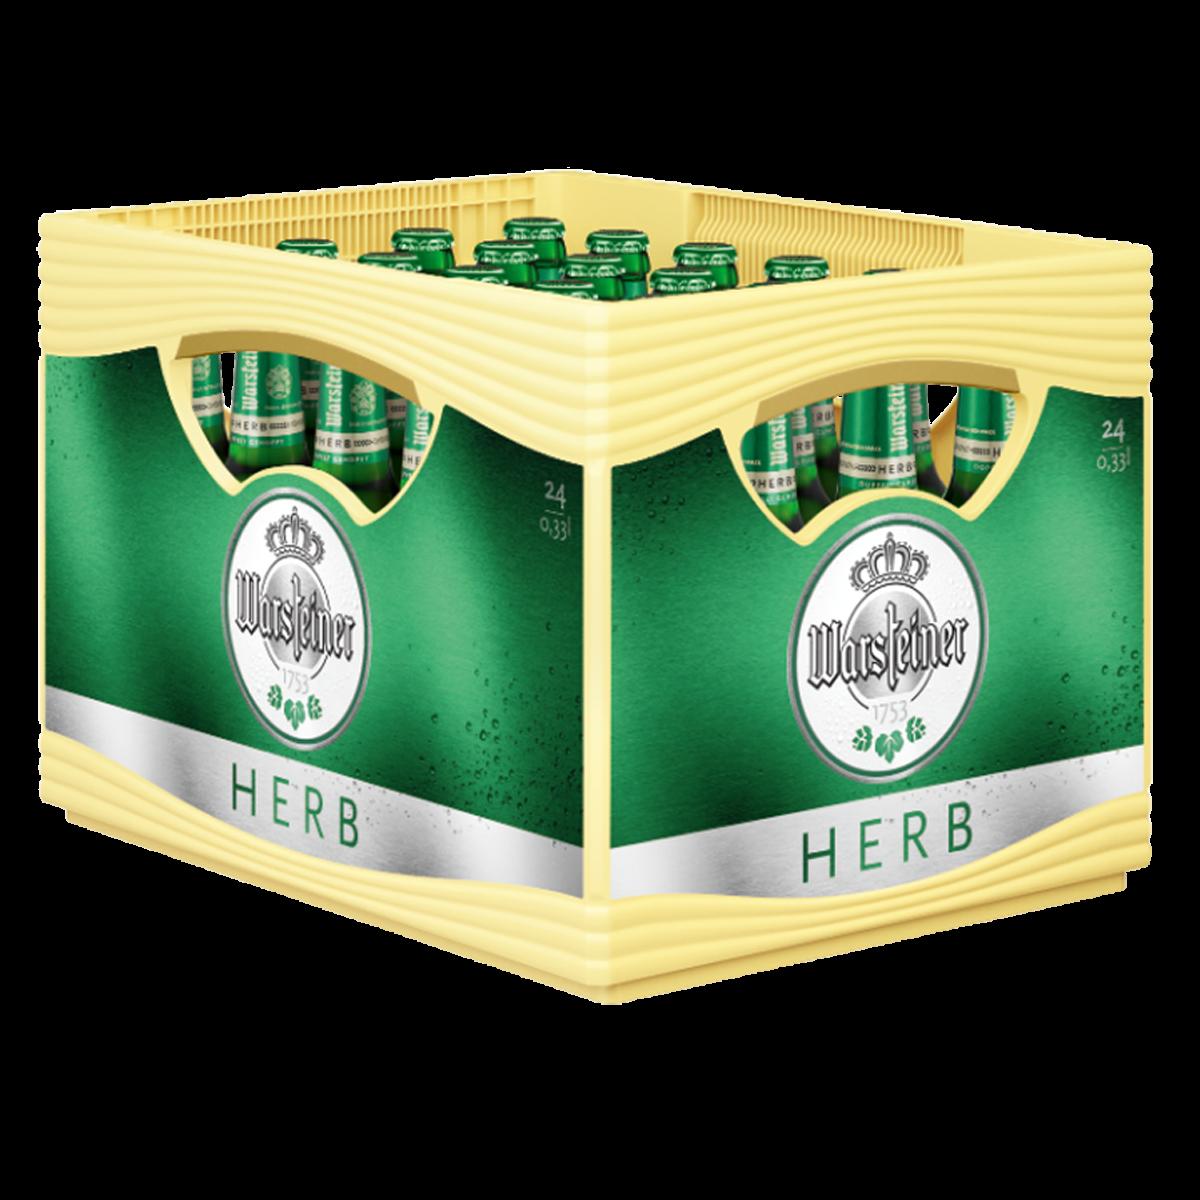 Warsteiner Herb 24 X 033l Pils Bier Sortiment Trinkgut